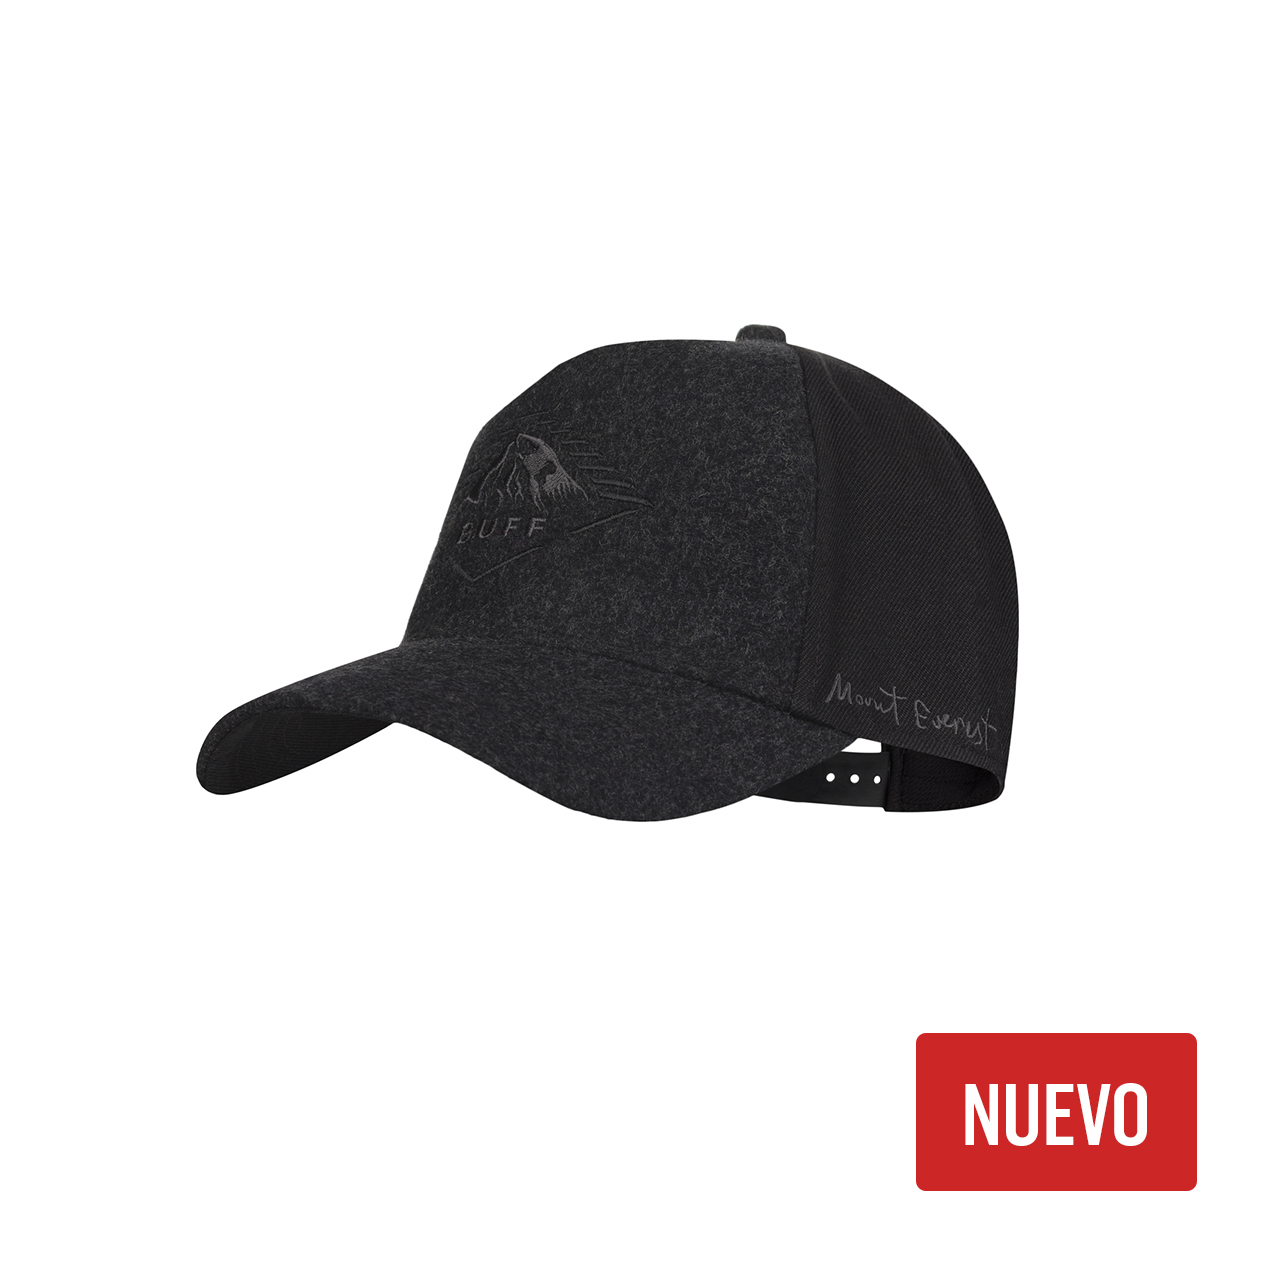 BUFF SNAPBACK CAP MOUNT EVEREST BLACK